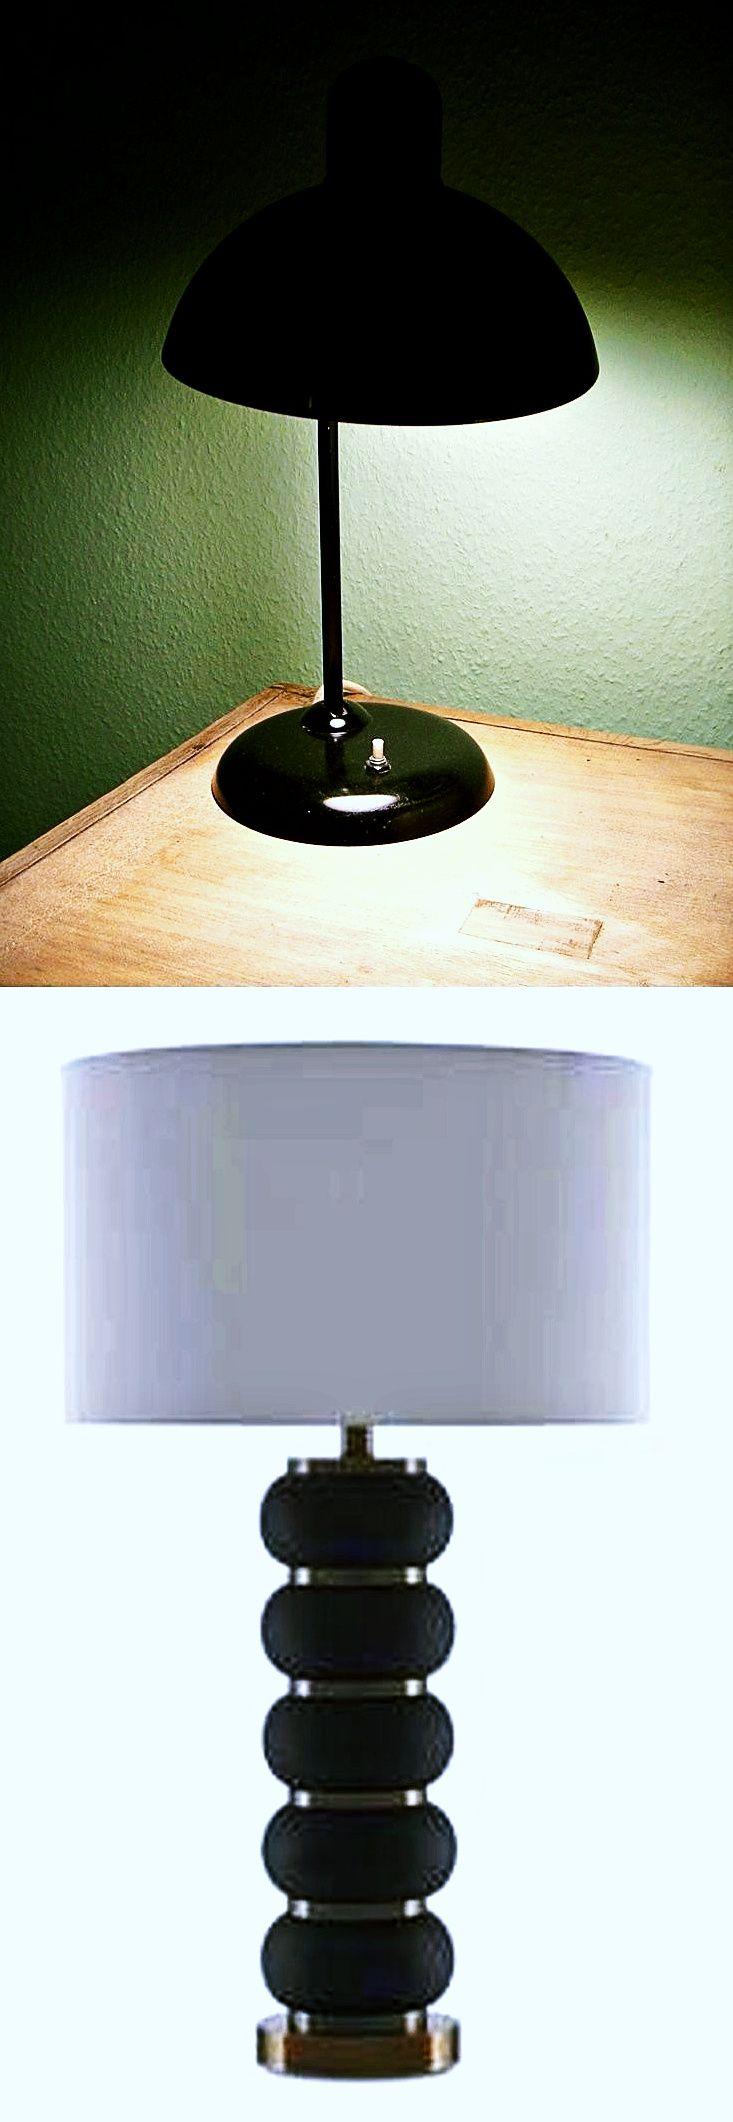 Tall Narrow Lamp Table Been Looking For Smalltablewithlamp Goldsidetablelamp Tallgoldtablelamp Smallbrowntablelamp Lamp Narrow Lamp Table Tall Lamps